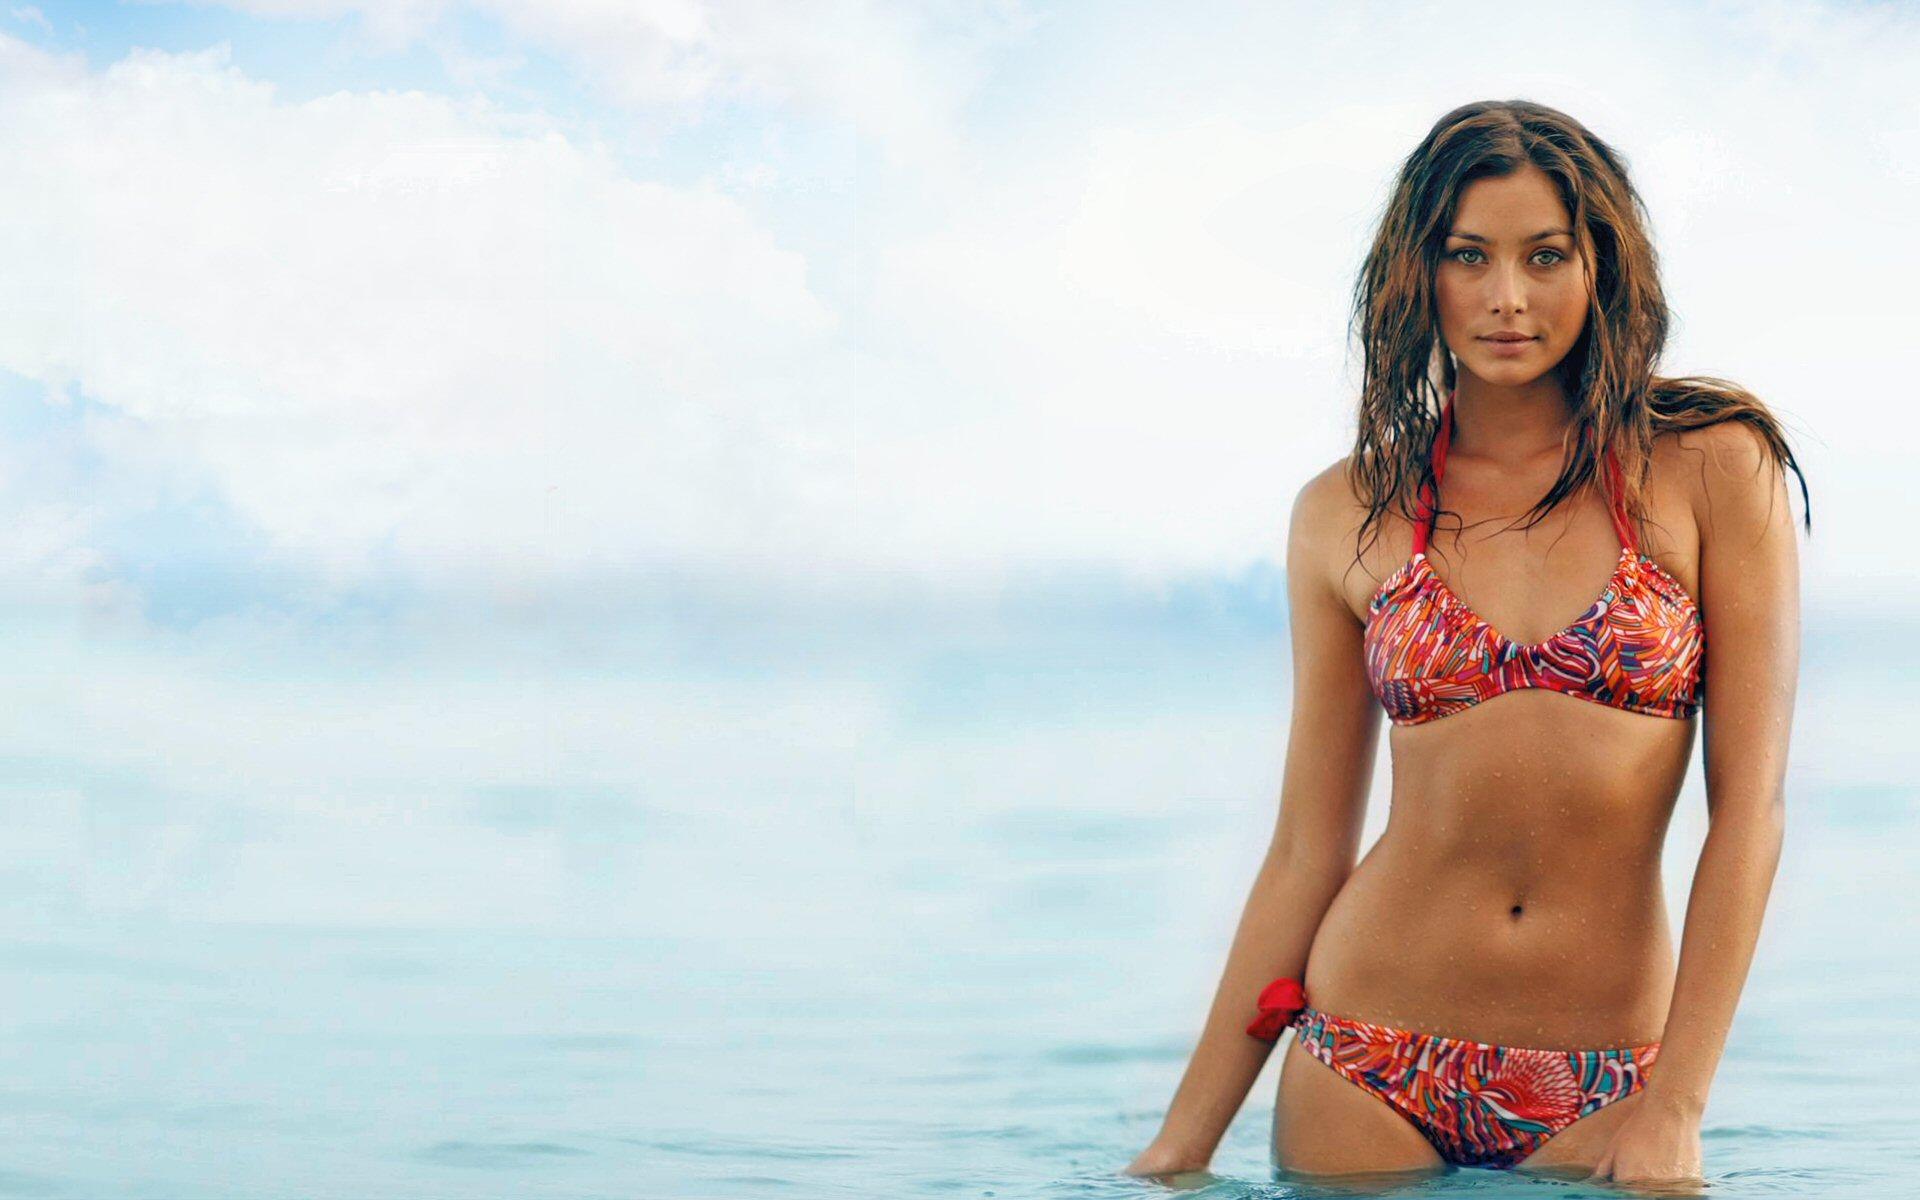 bikini desktop wallpaper 722